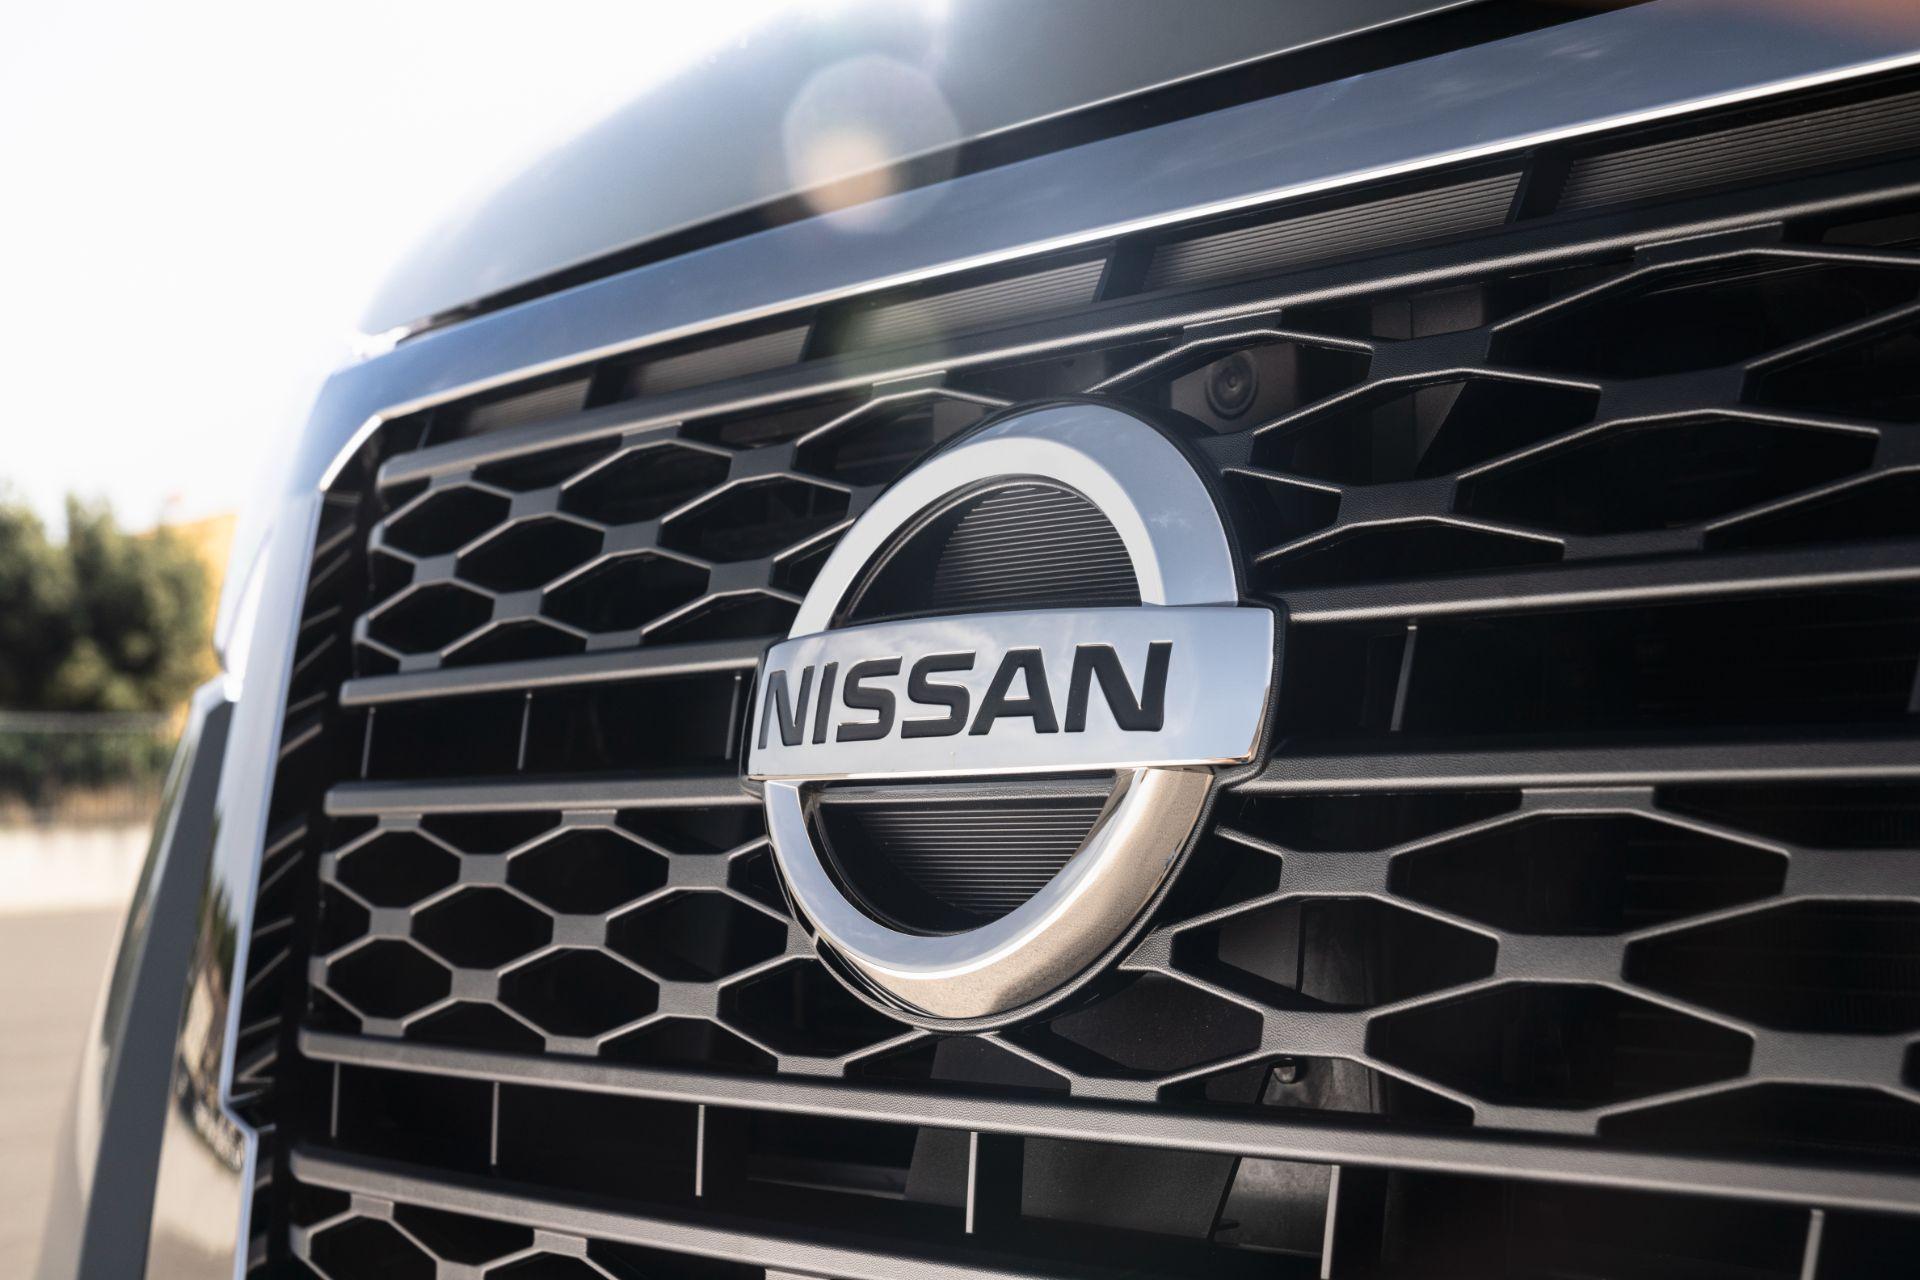 2022-Nissan-Primastar-Van-5-1